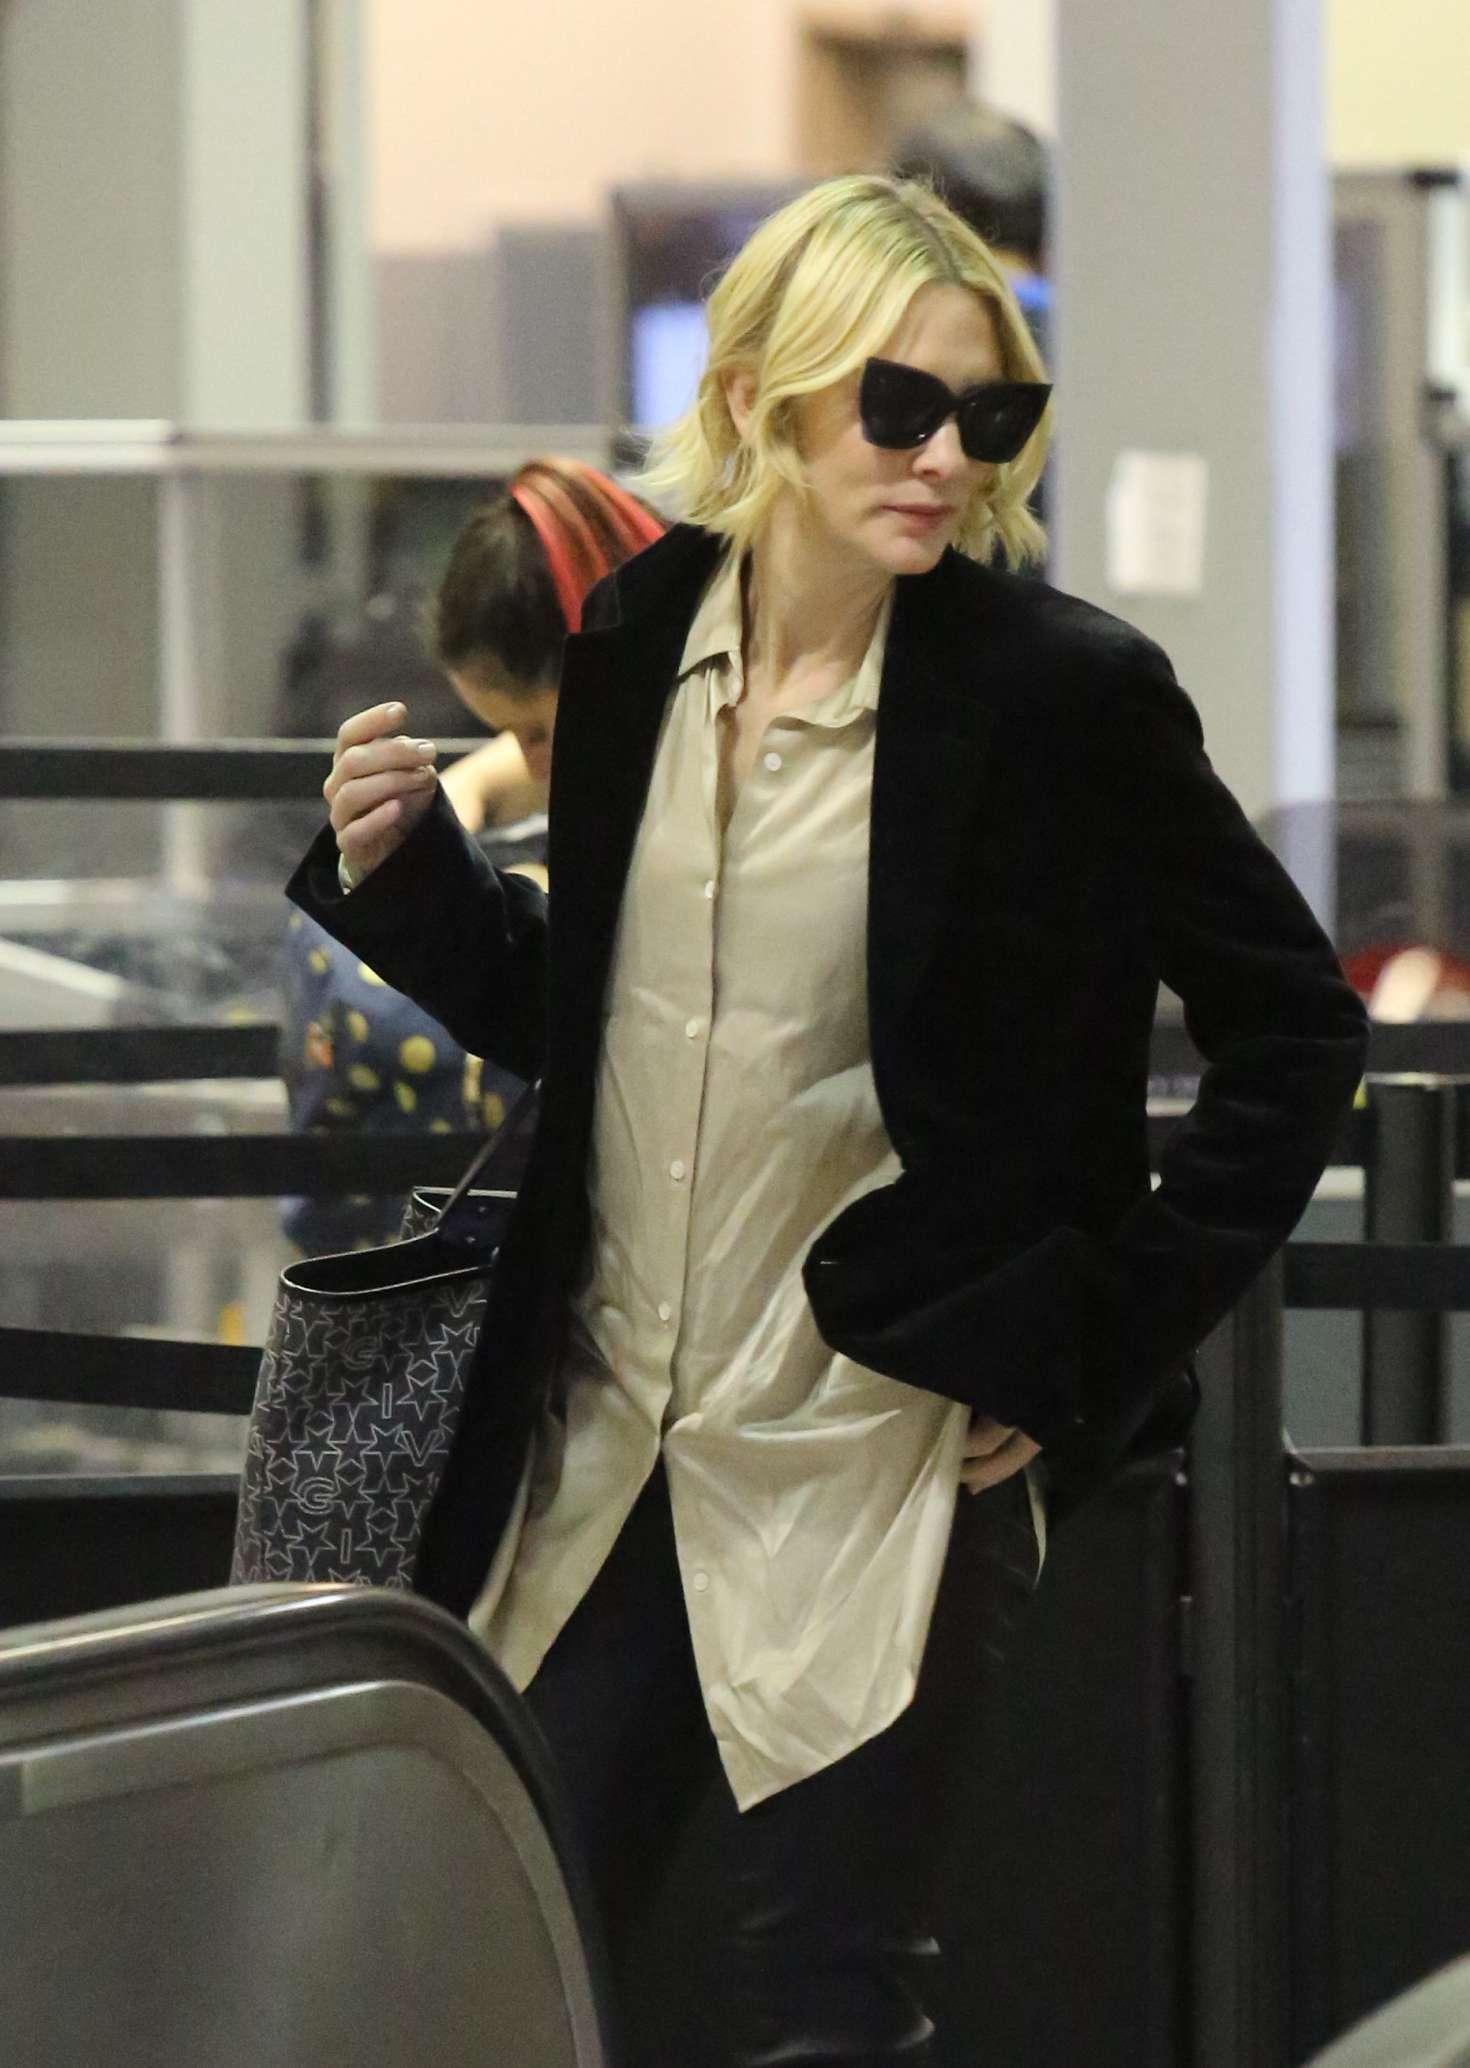 Cate Blanchett 2017 : Cate Blanchett at Los Angeles International Airport -14